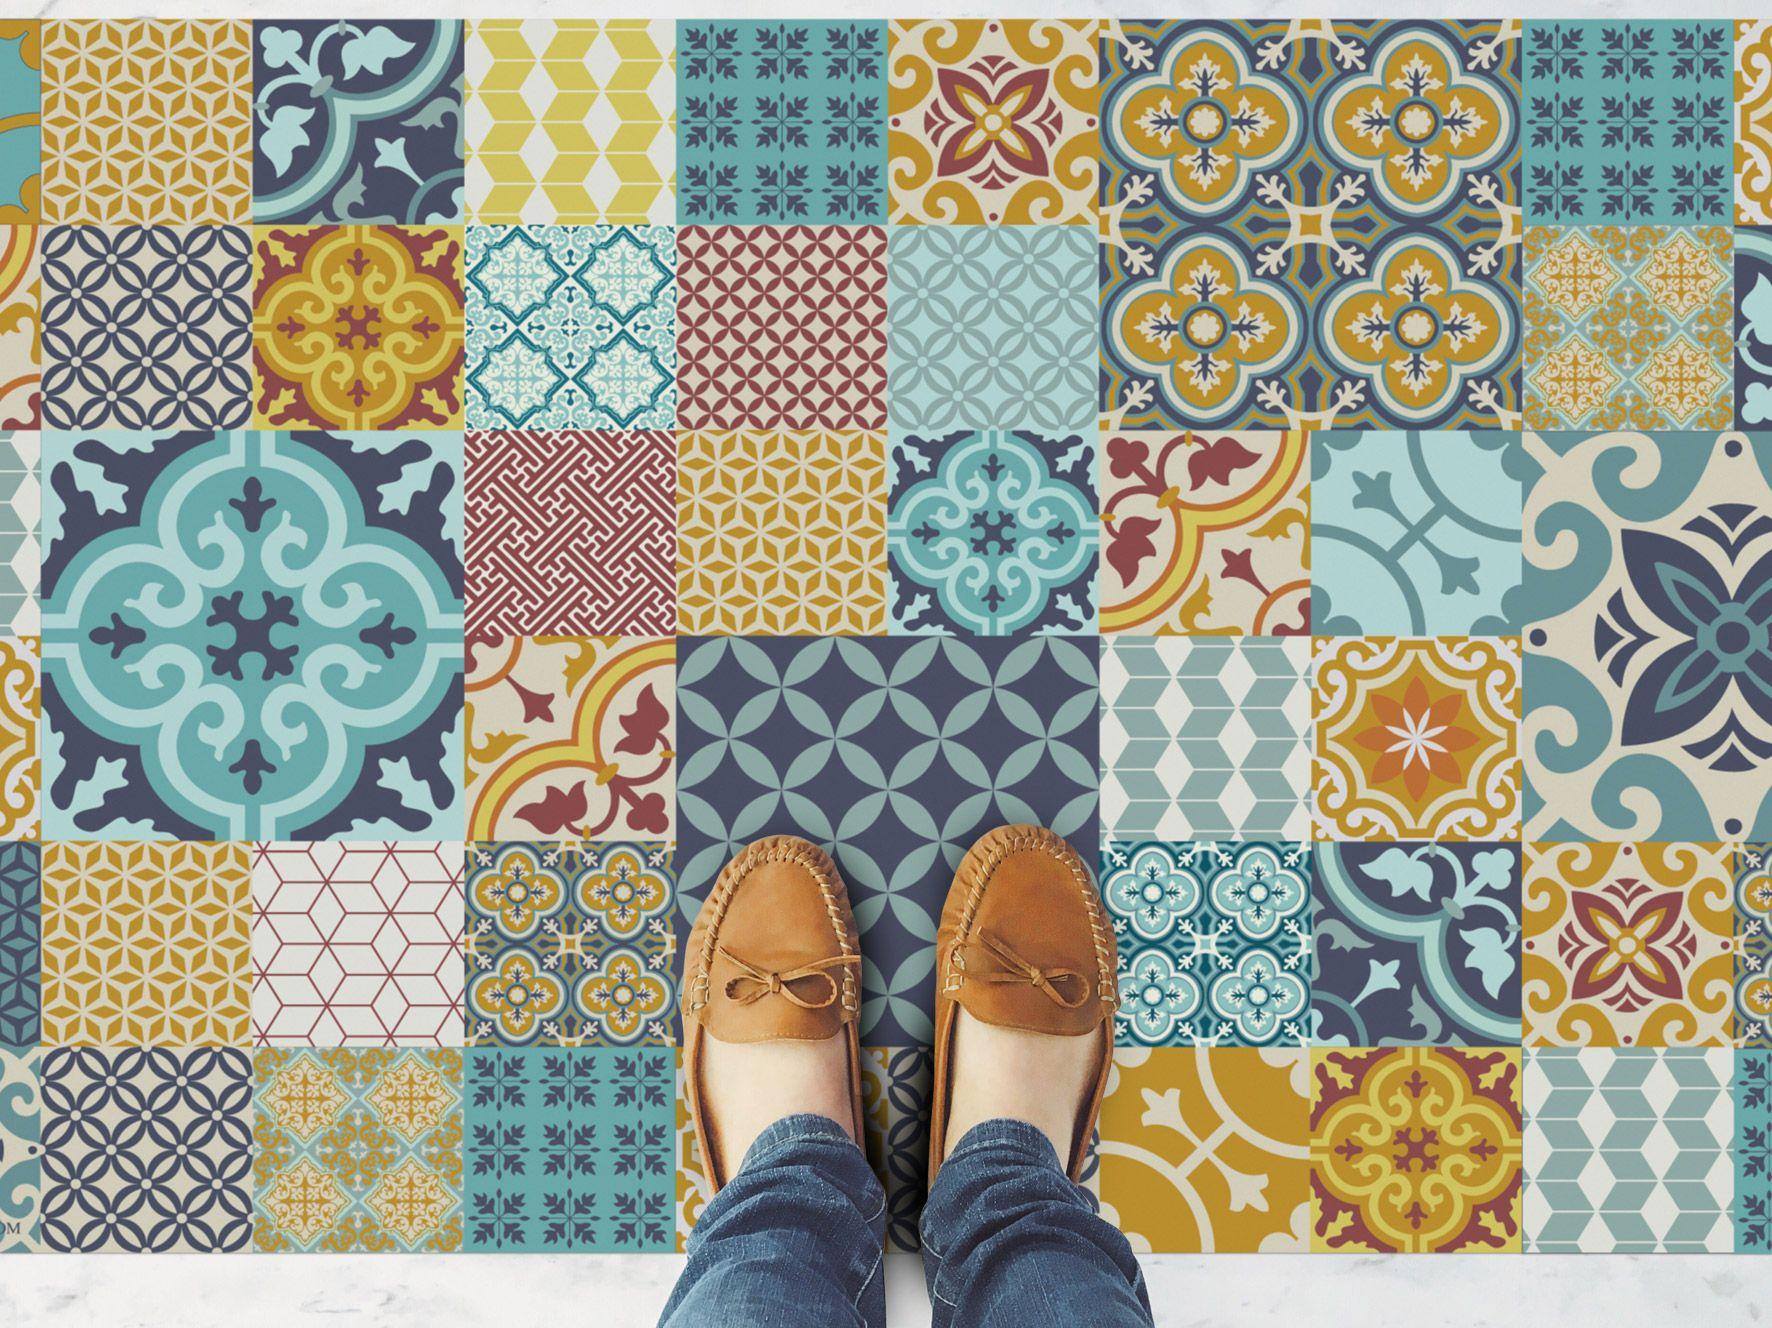 Floor Mat Rug Carpet Linoleum P V C Vinyl Colourful Geometric Tiles Vintage Bathroom Hall Kitchen Room Colorfu Vinyl Flooring Vinyl Flooring Kitchen Flooring